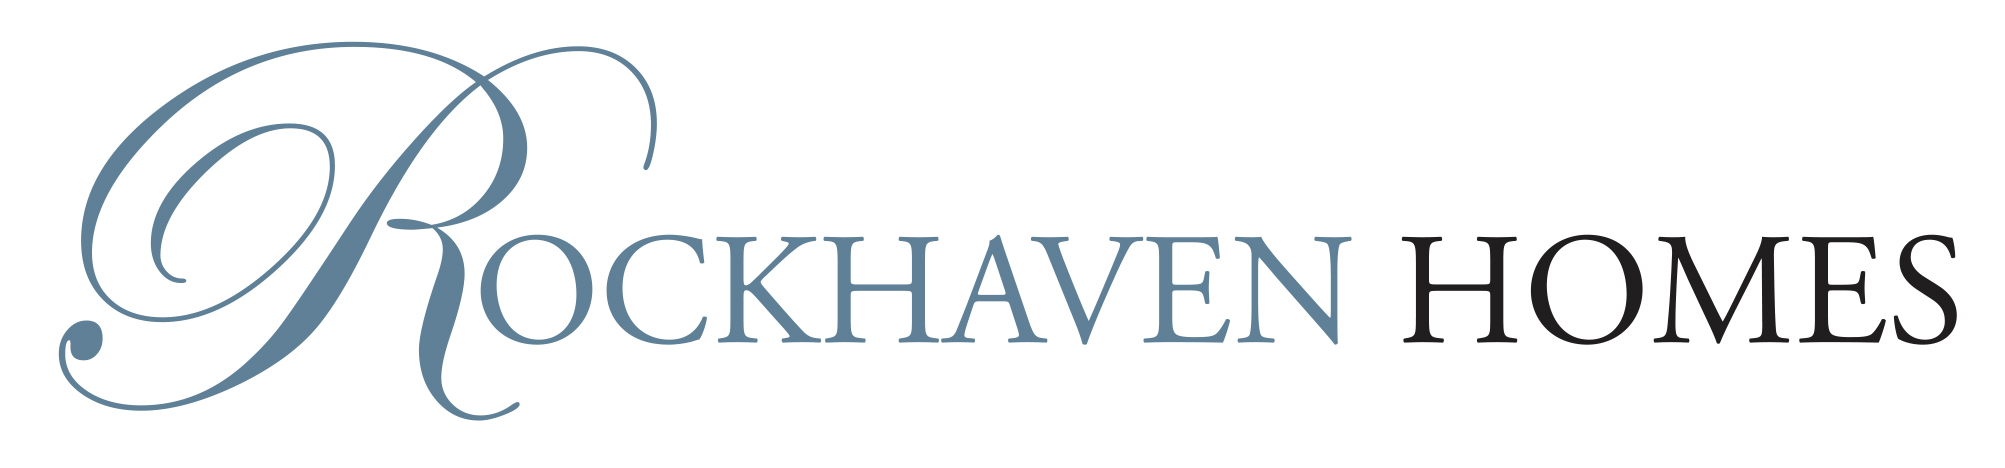 Rockhaven Homes